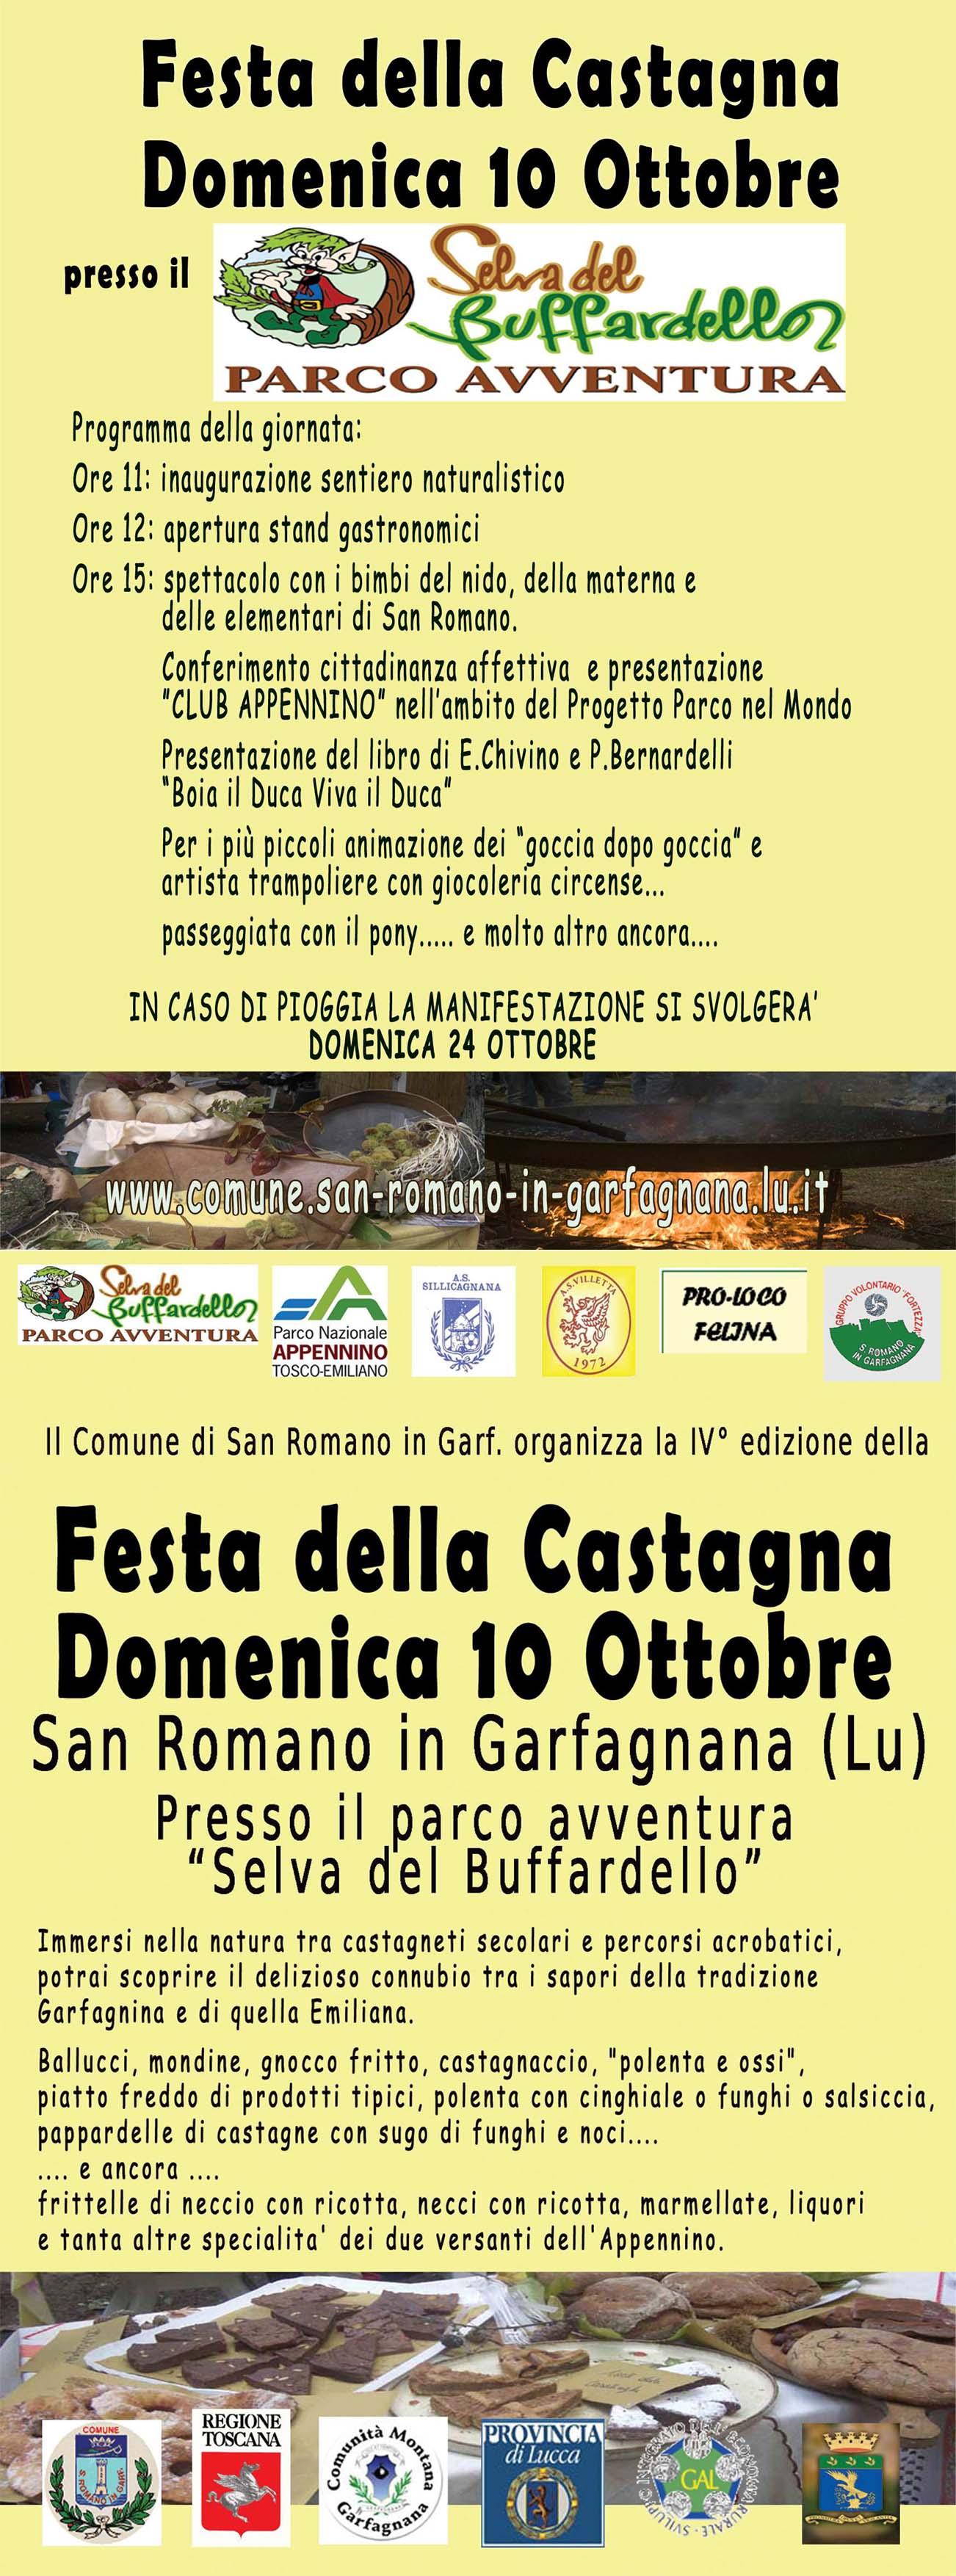 volantino_castagna_2010_copleto.jpg